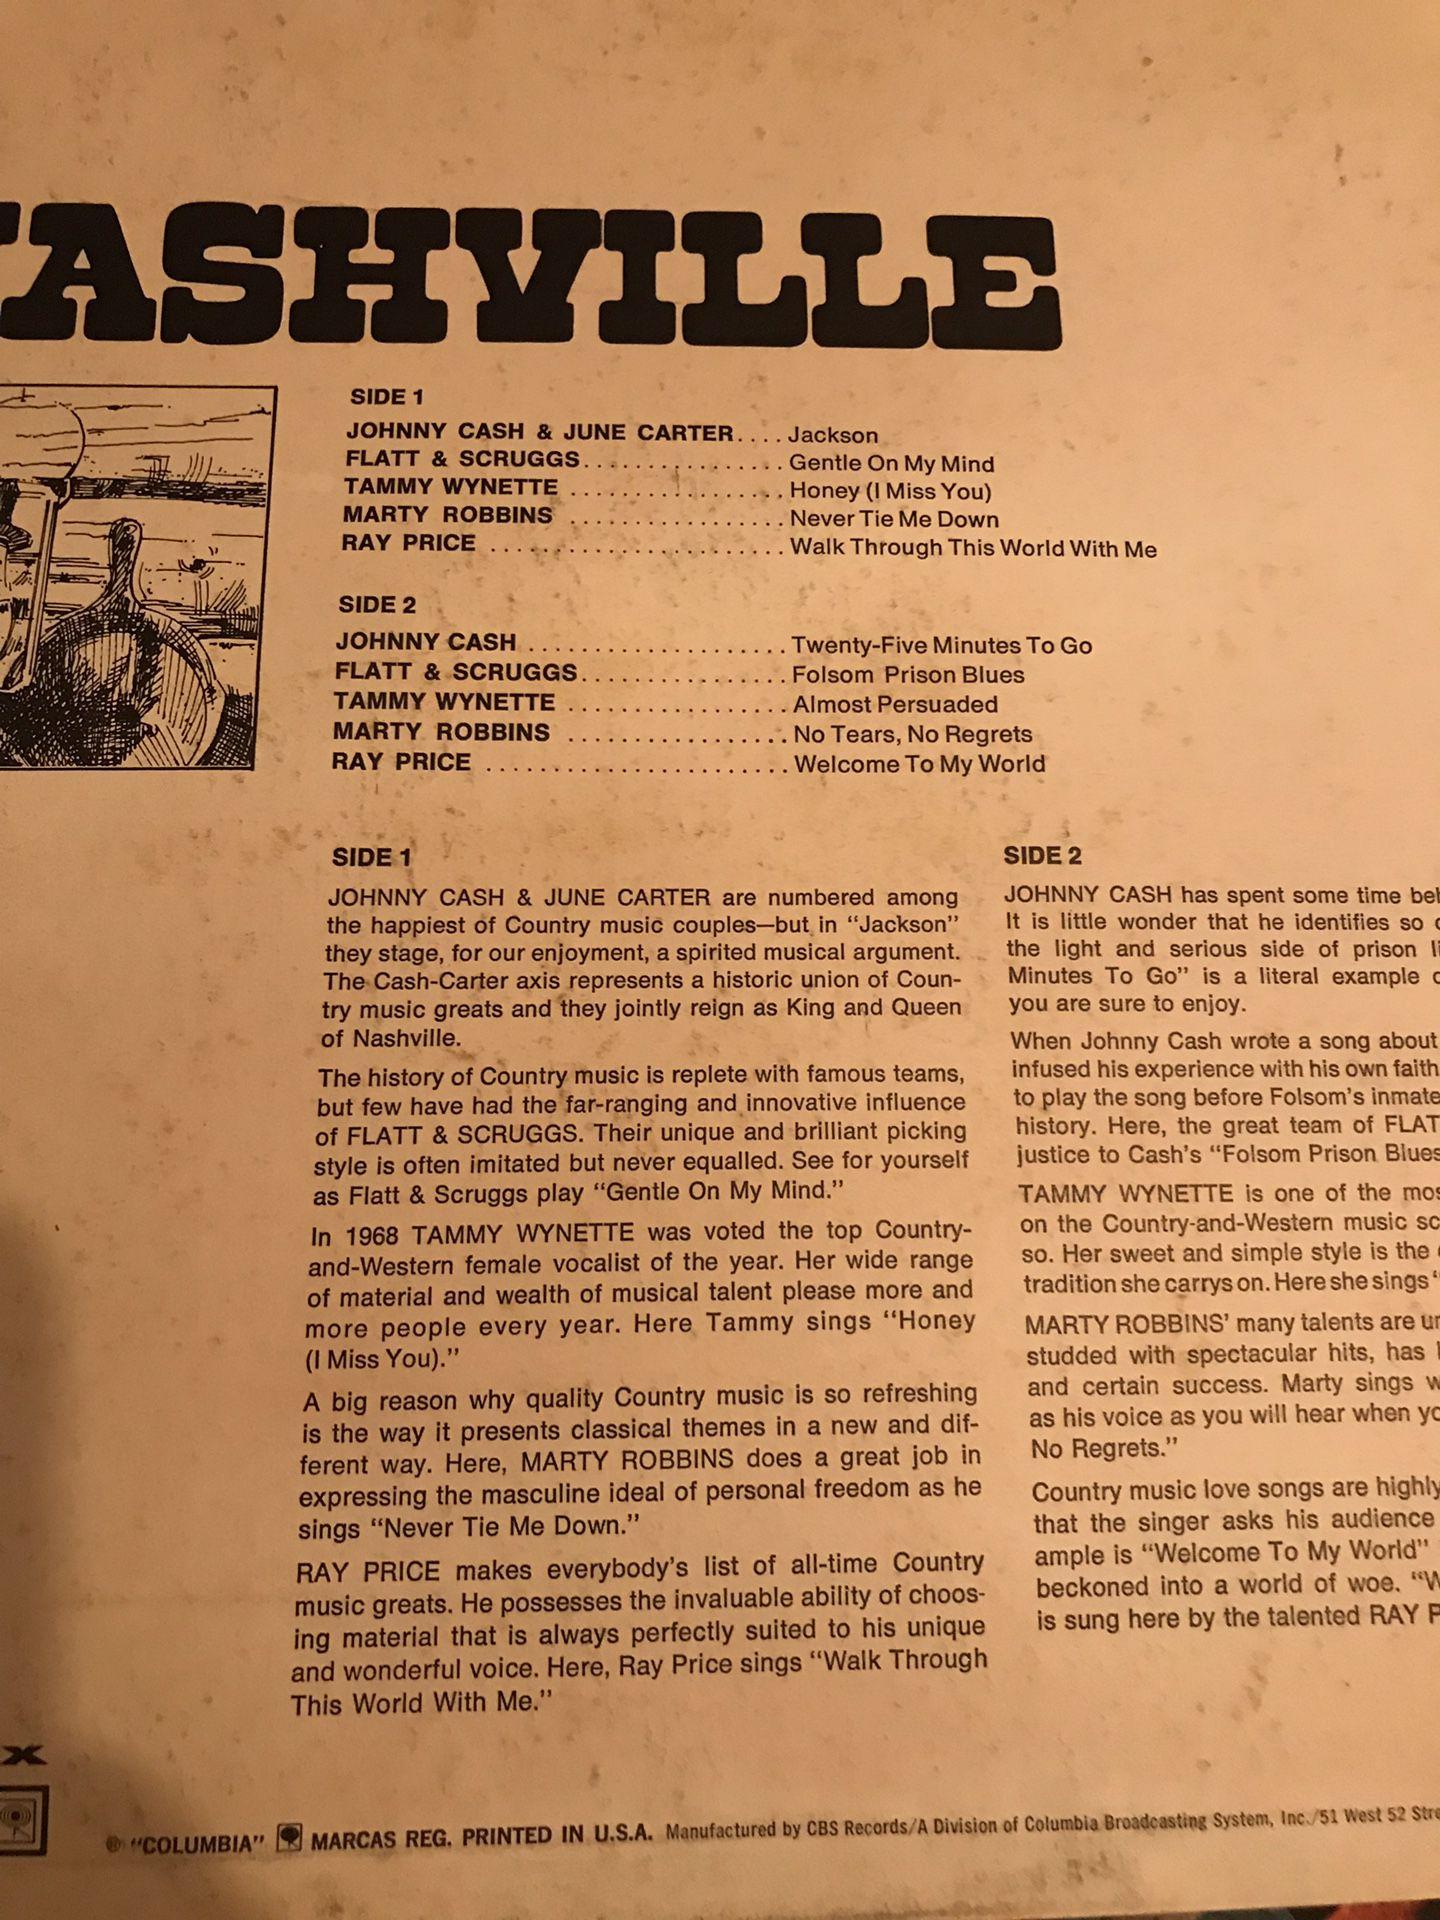 Vinyl record Nashville